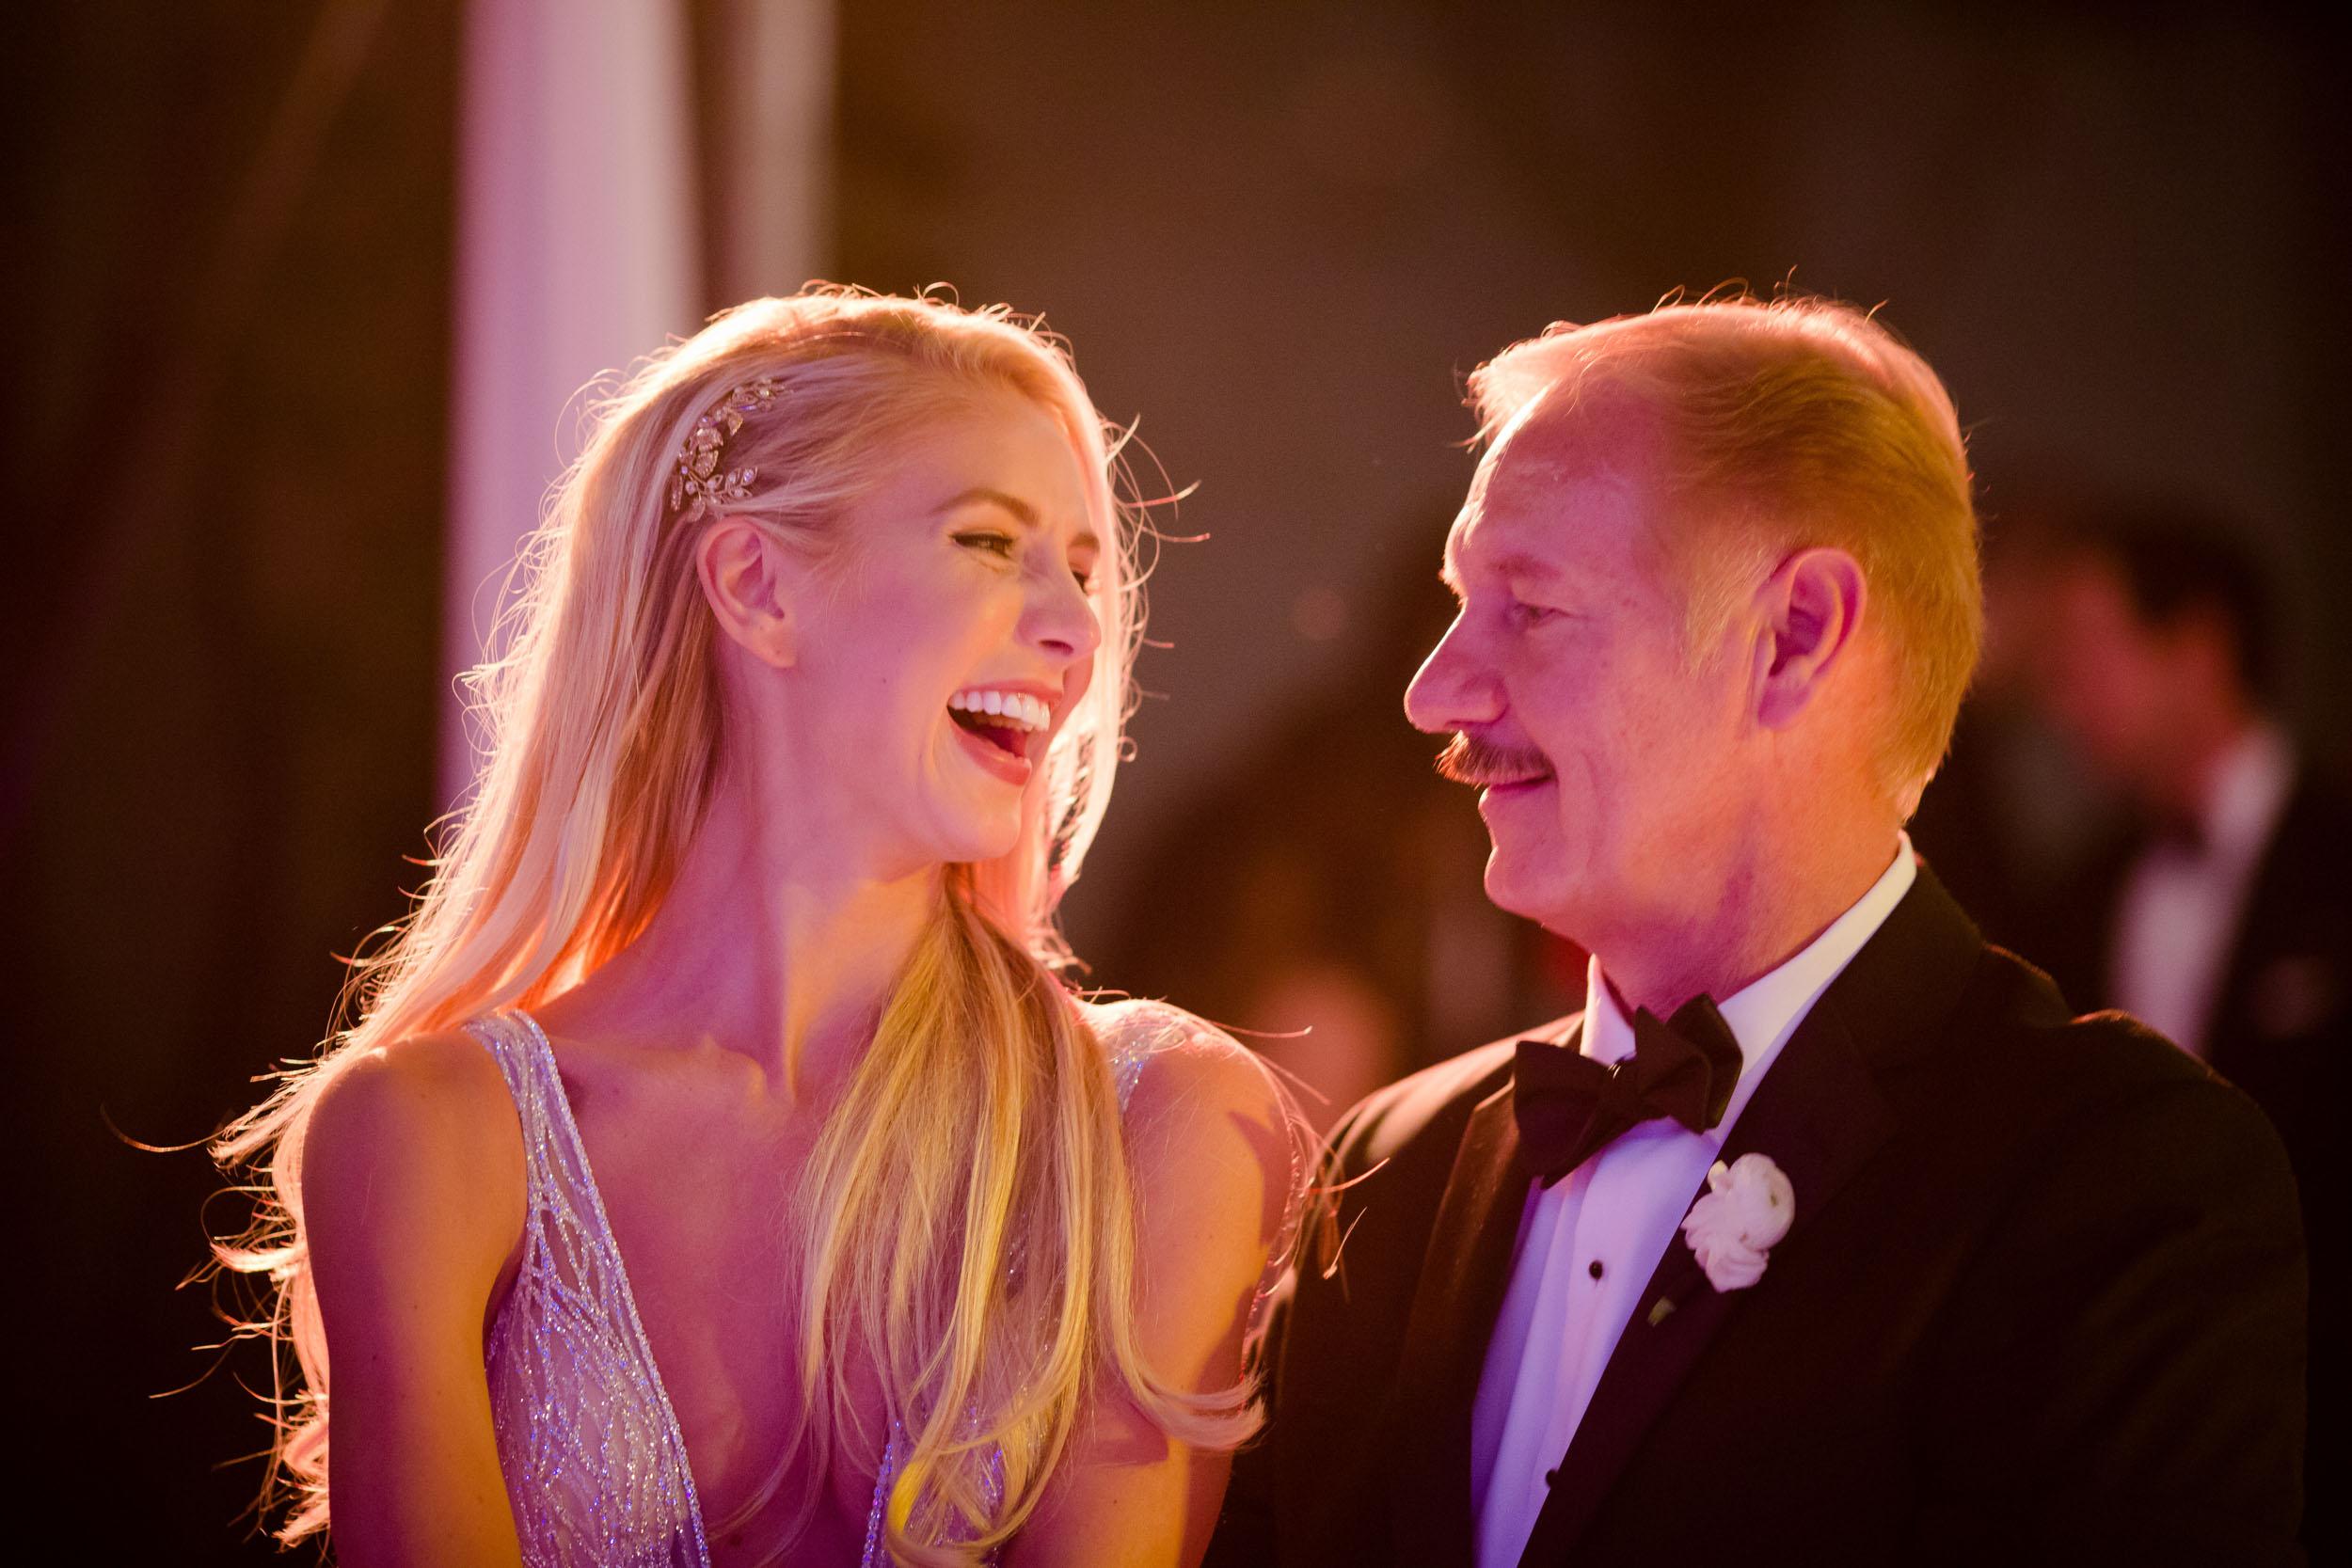 chicago-illuminating-co-wedding-photos-69.jpg